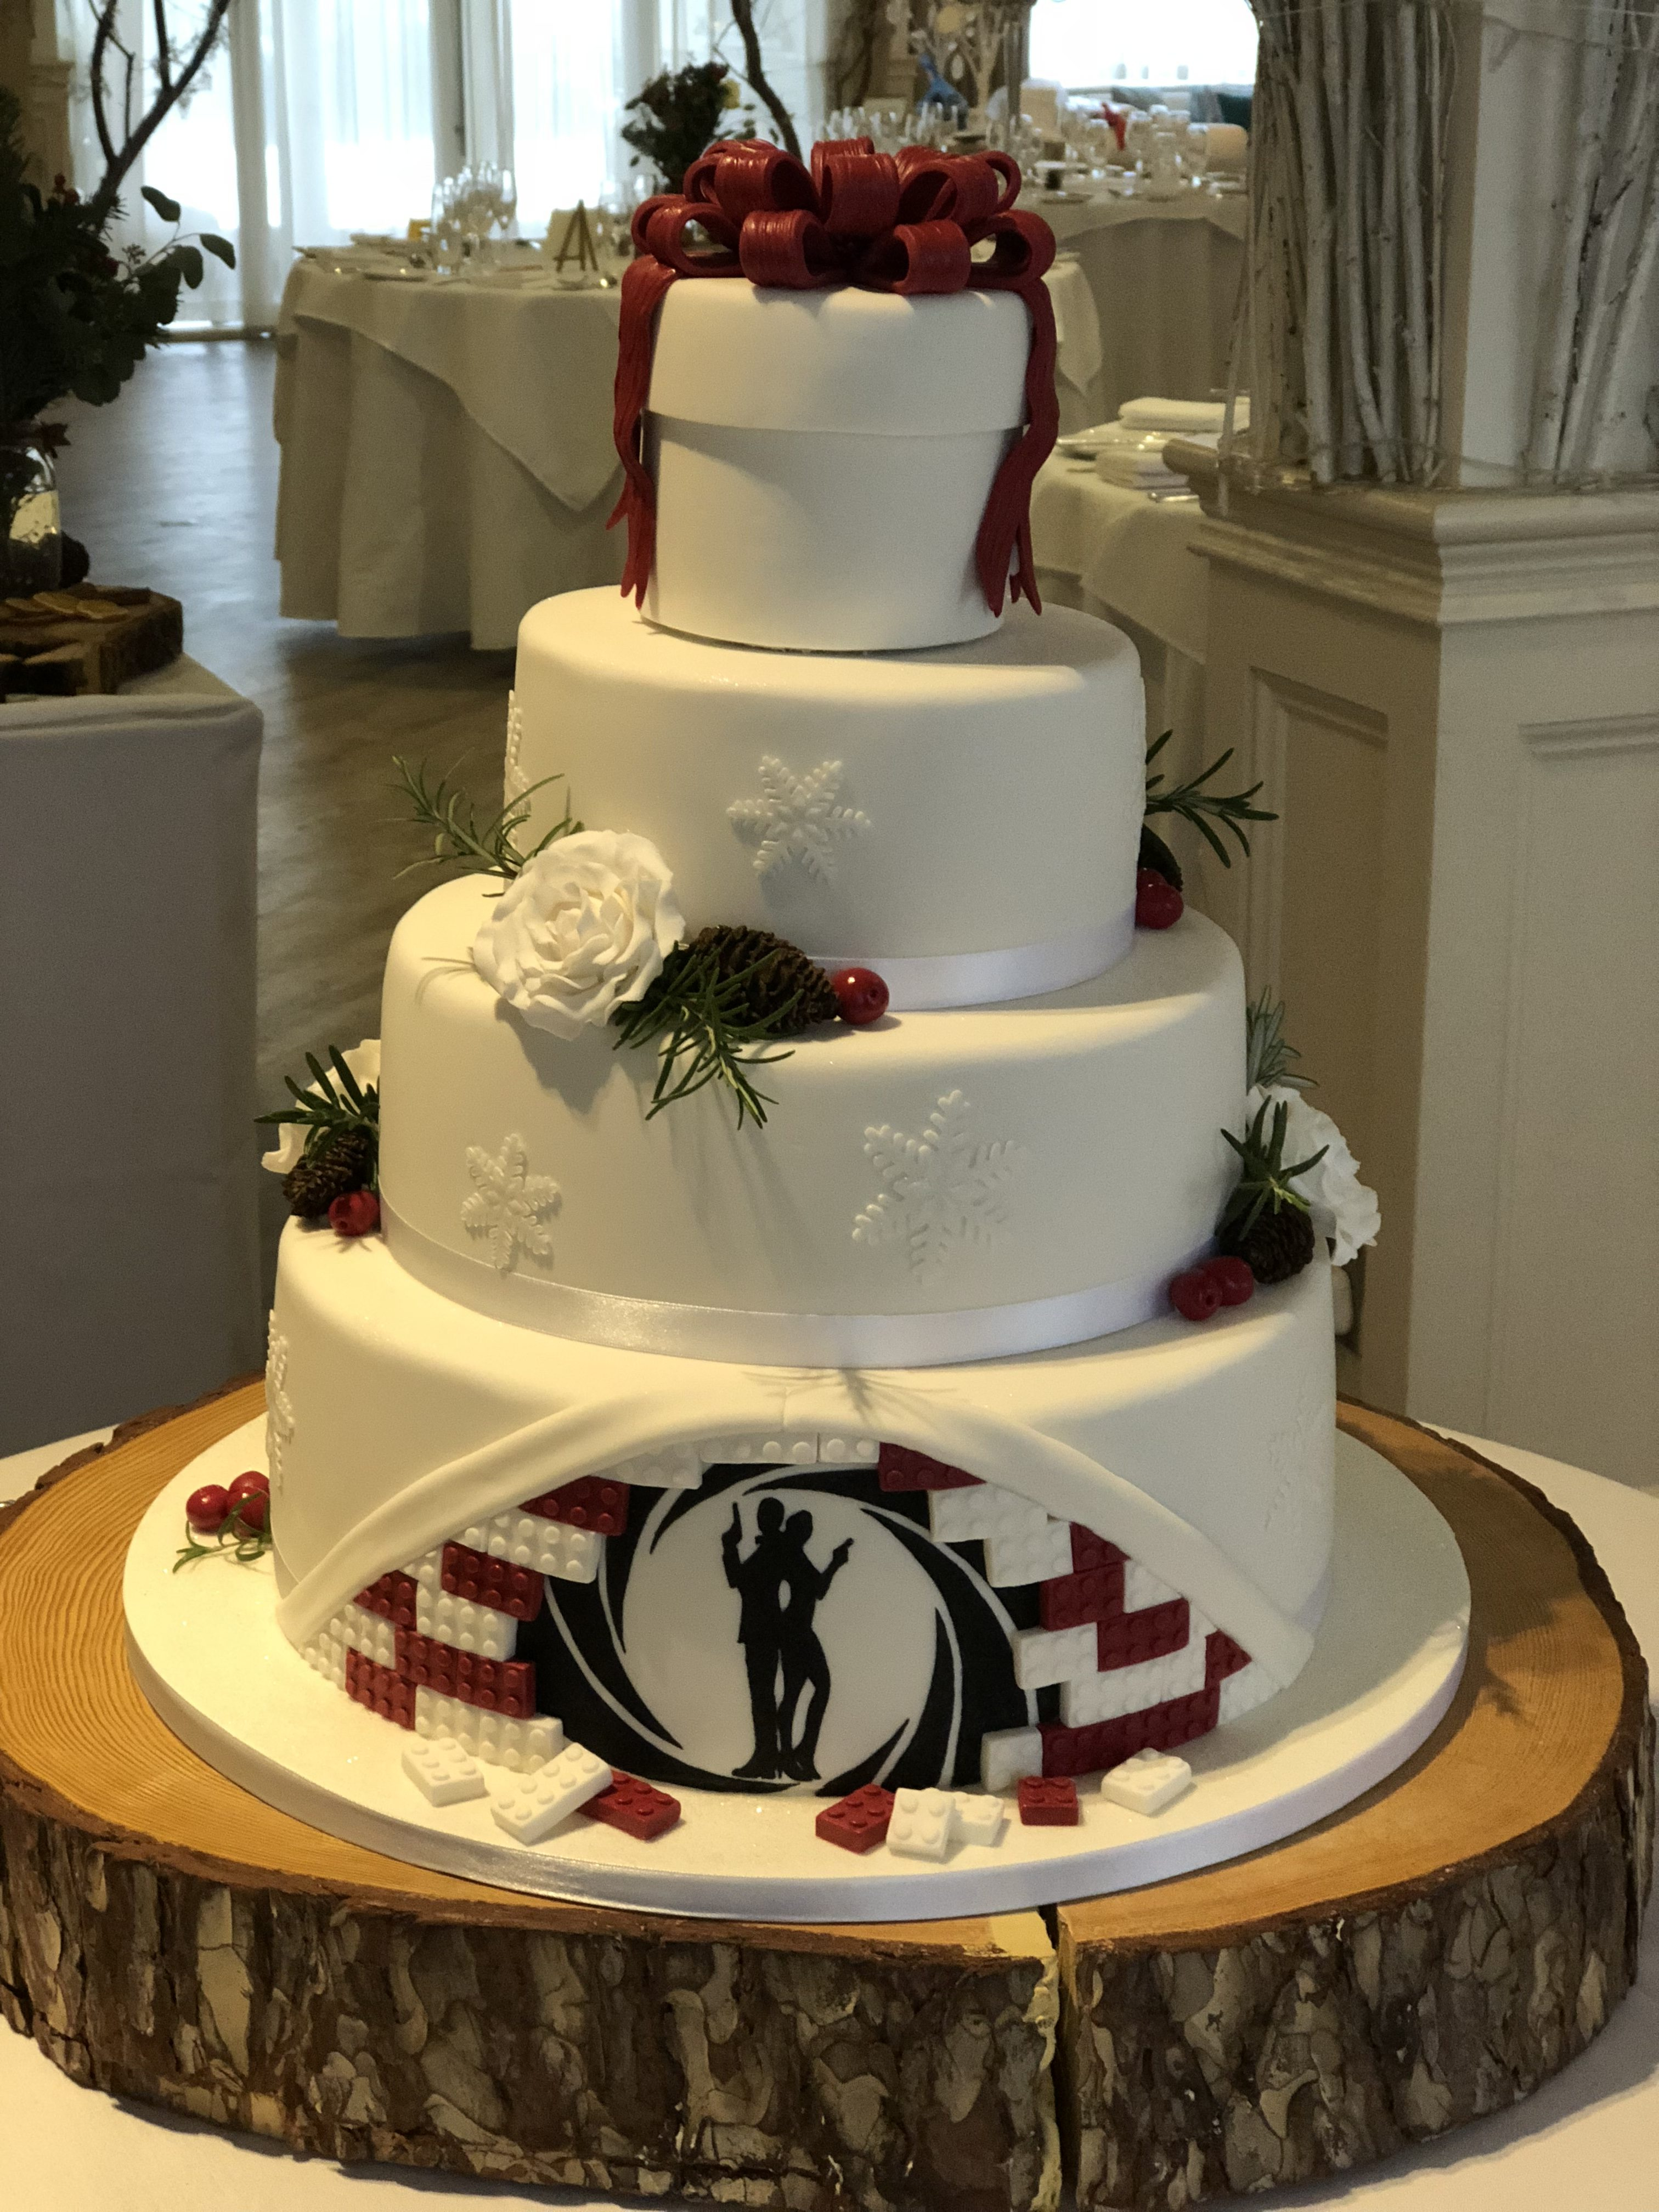 Winter, Rabbit, 007 & Lego Wedding Cake